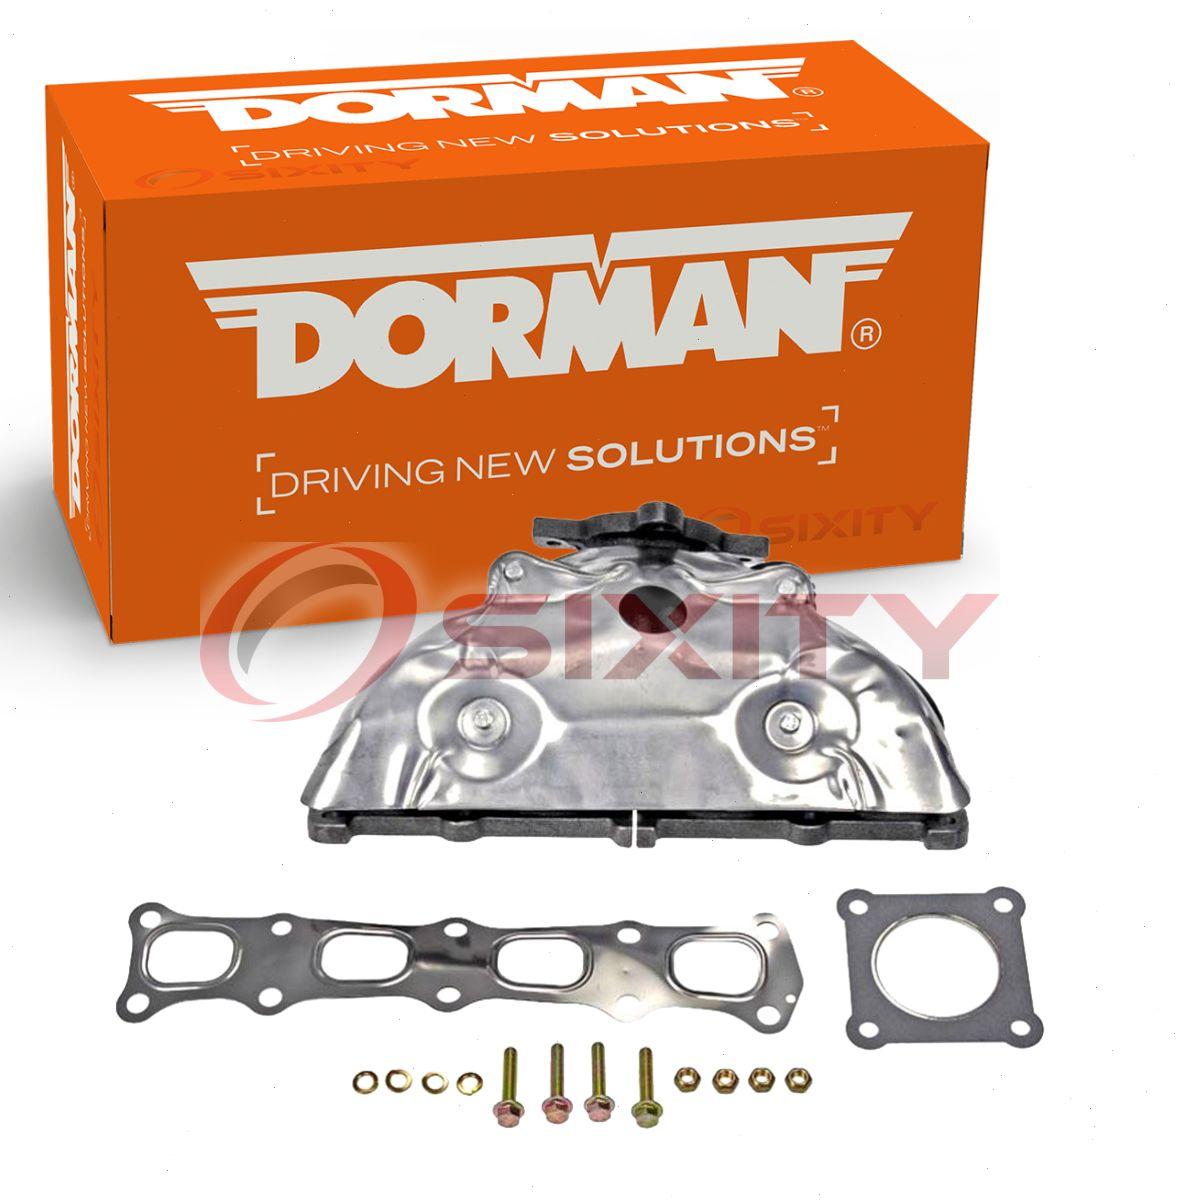 Dorman Exhaust Manifold for Chevy Equinox 2010-2012 2.4L L4 hd